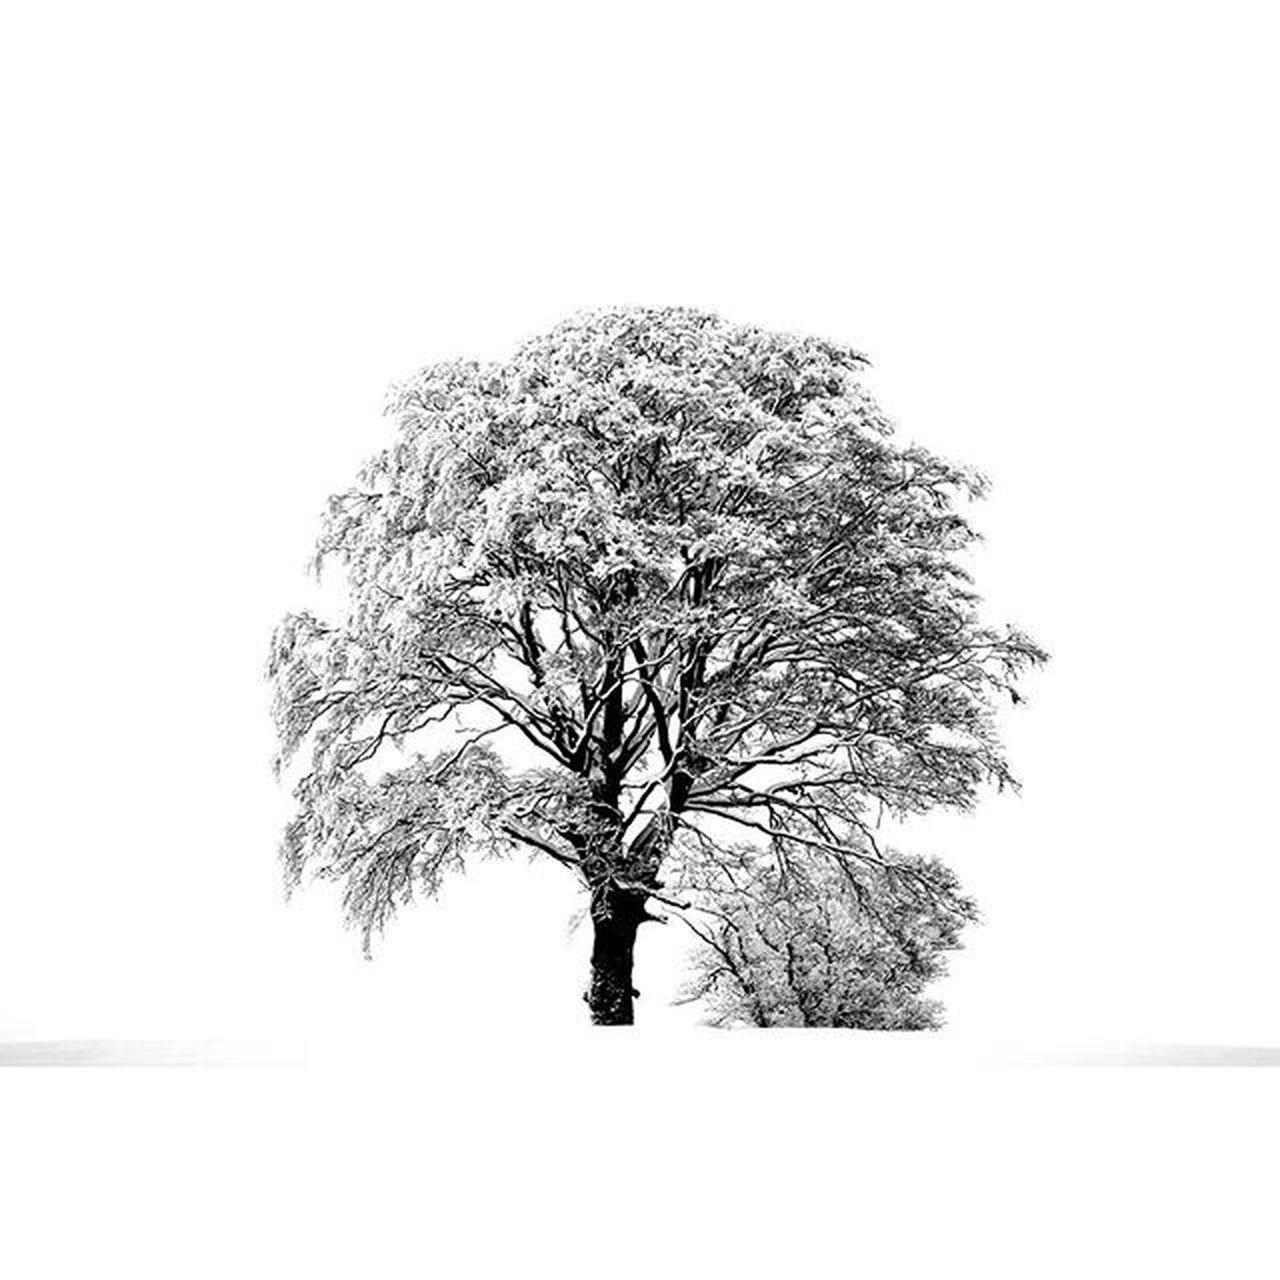 Tree Winter Rural Rurallife  Winterwonderland Snow White ScottishBorders Scotland Lifeasiseeit Flora Johnnelson Arboreal Arborealbeauty Branches Blackandwhite Mono